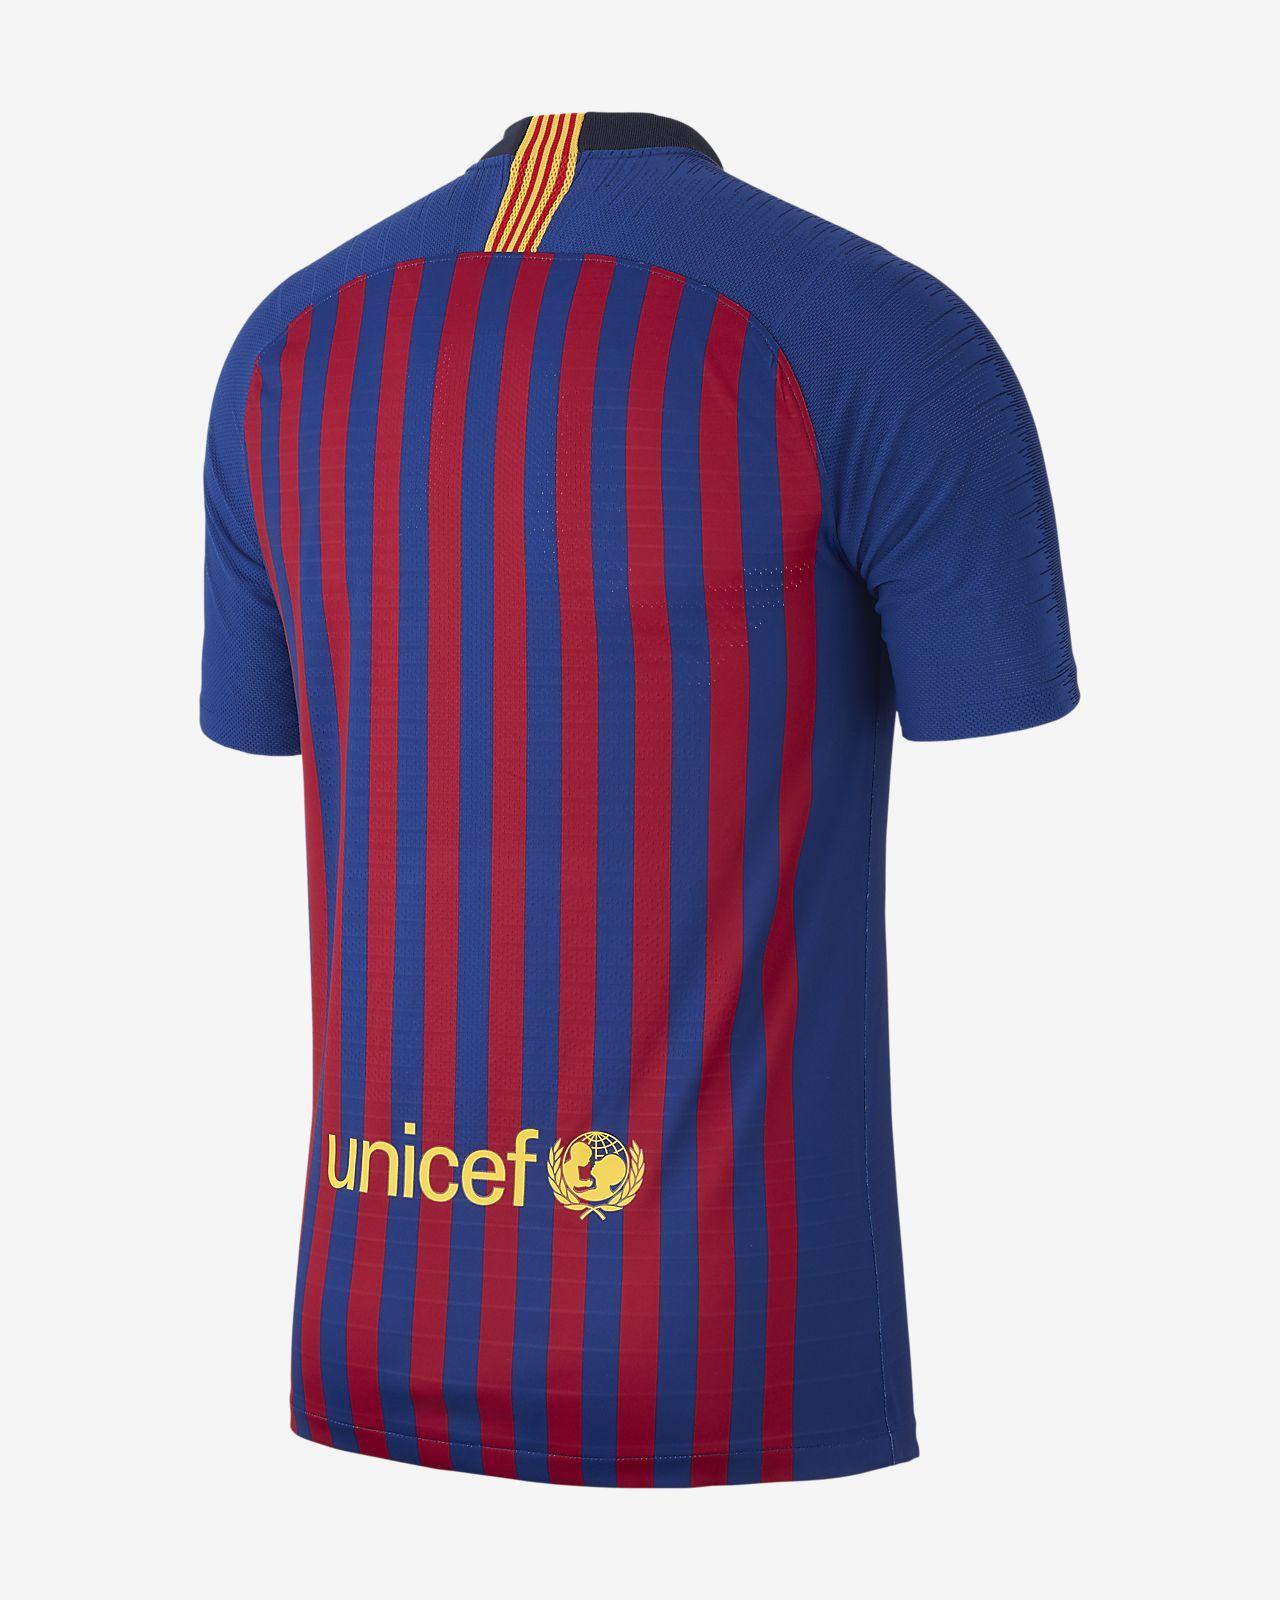 00891c5b871d 2018 19 FC Barcelona Vapor Match Home Men s Football Shirt. Nike.com CA